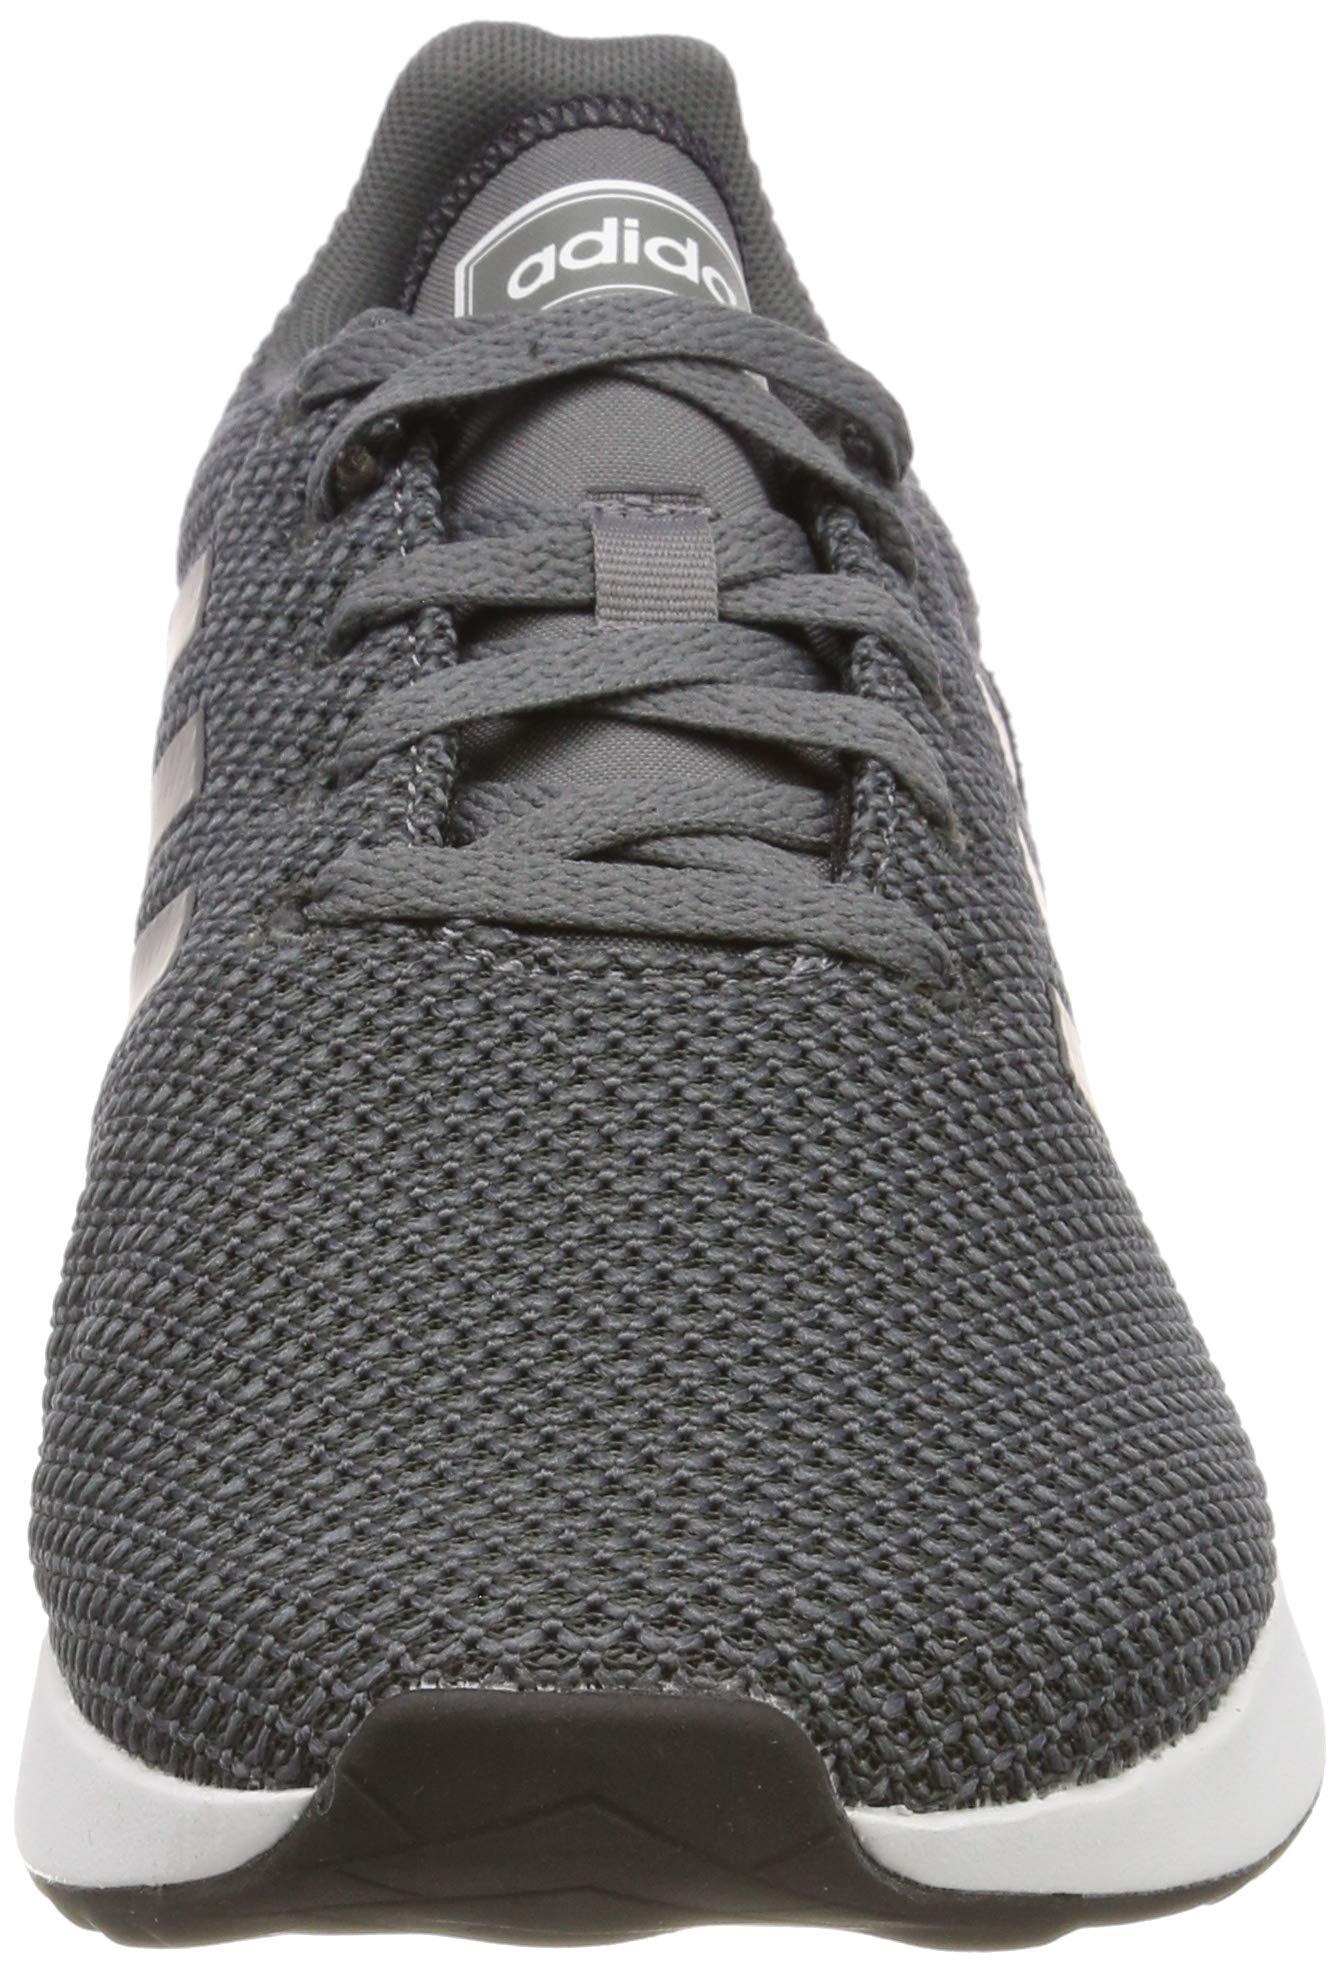 adidas Run70s, Scarpe da Running Uomo 4 spesavip